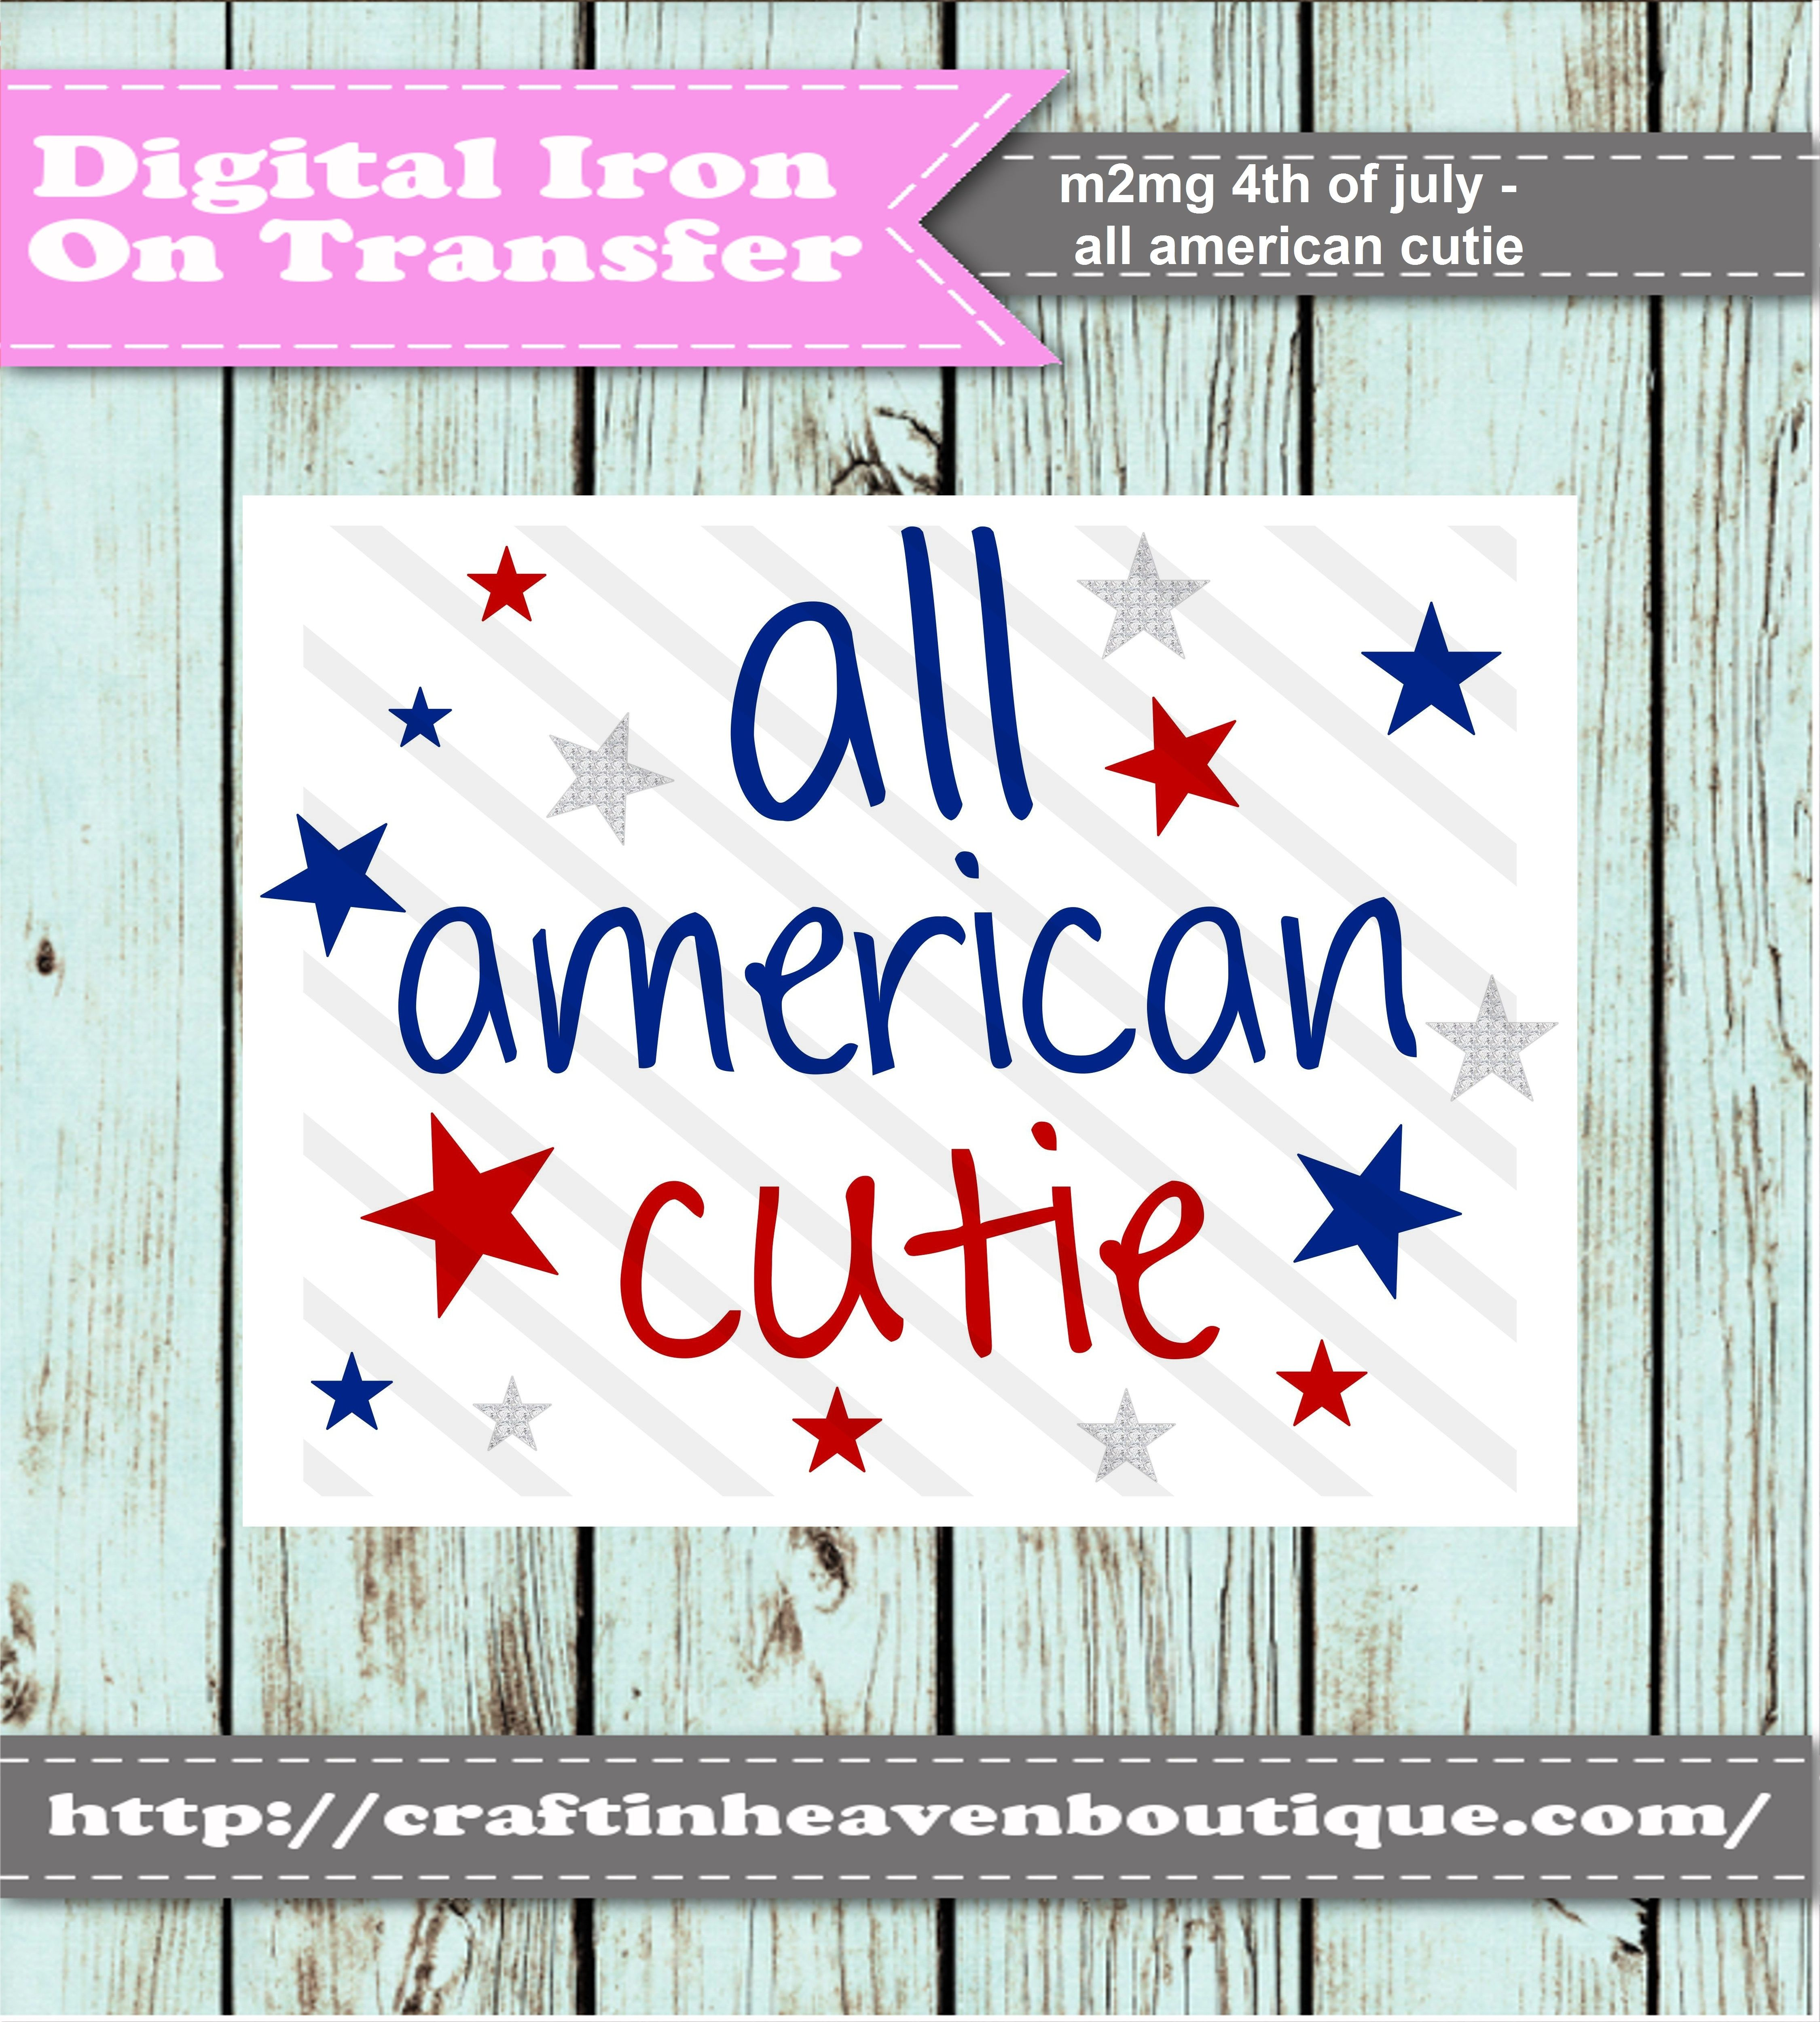 Diy printable iron on transfer all american cutie 350